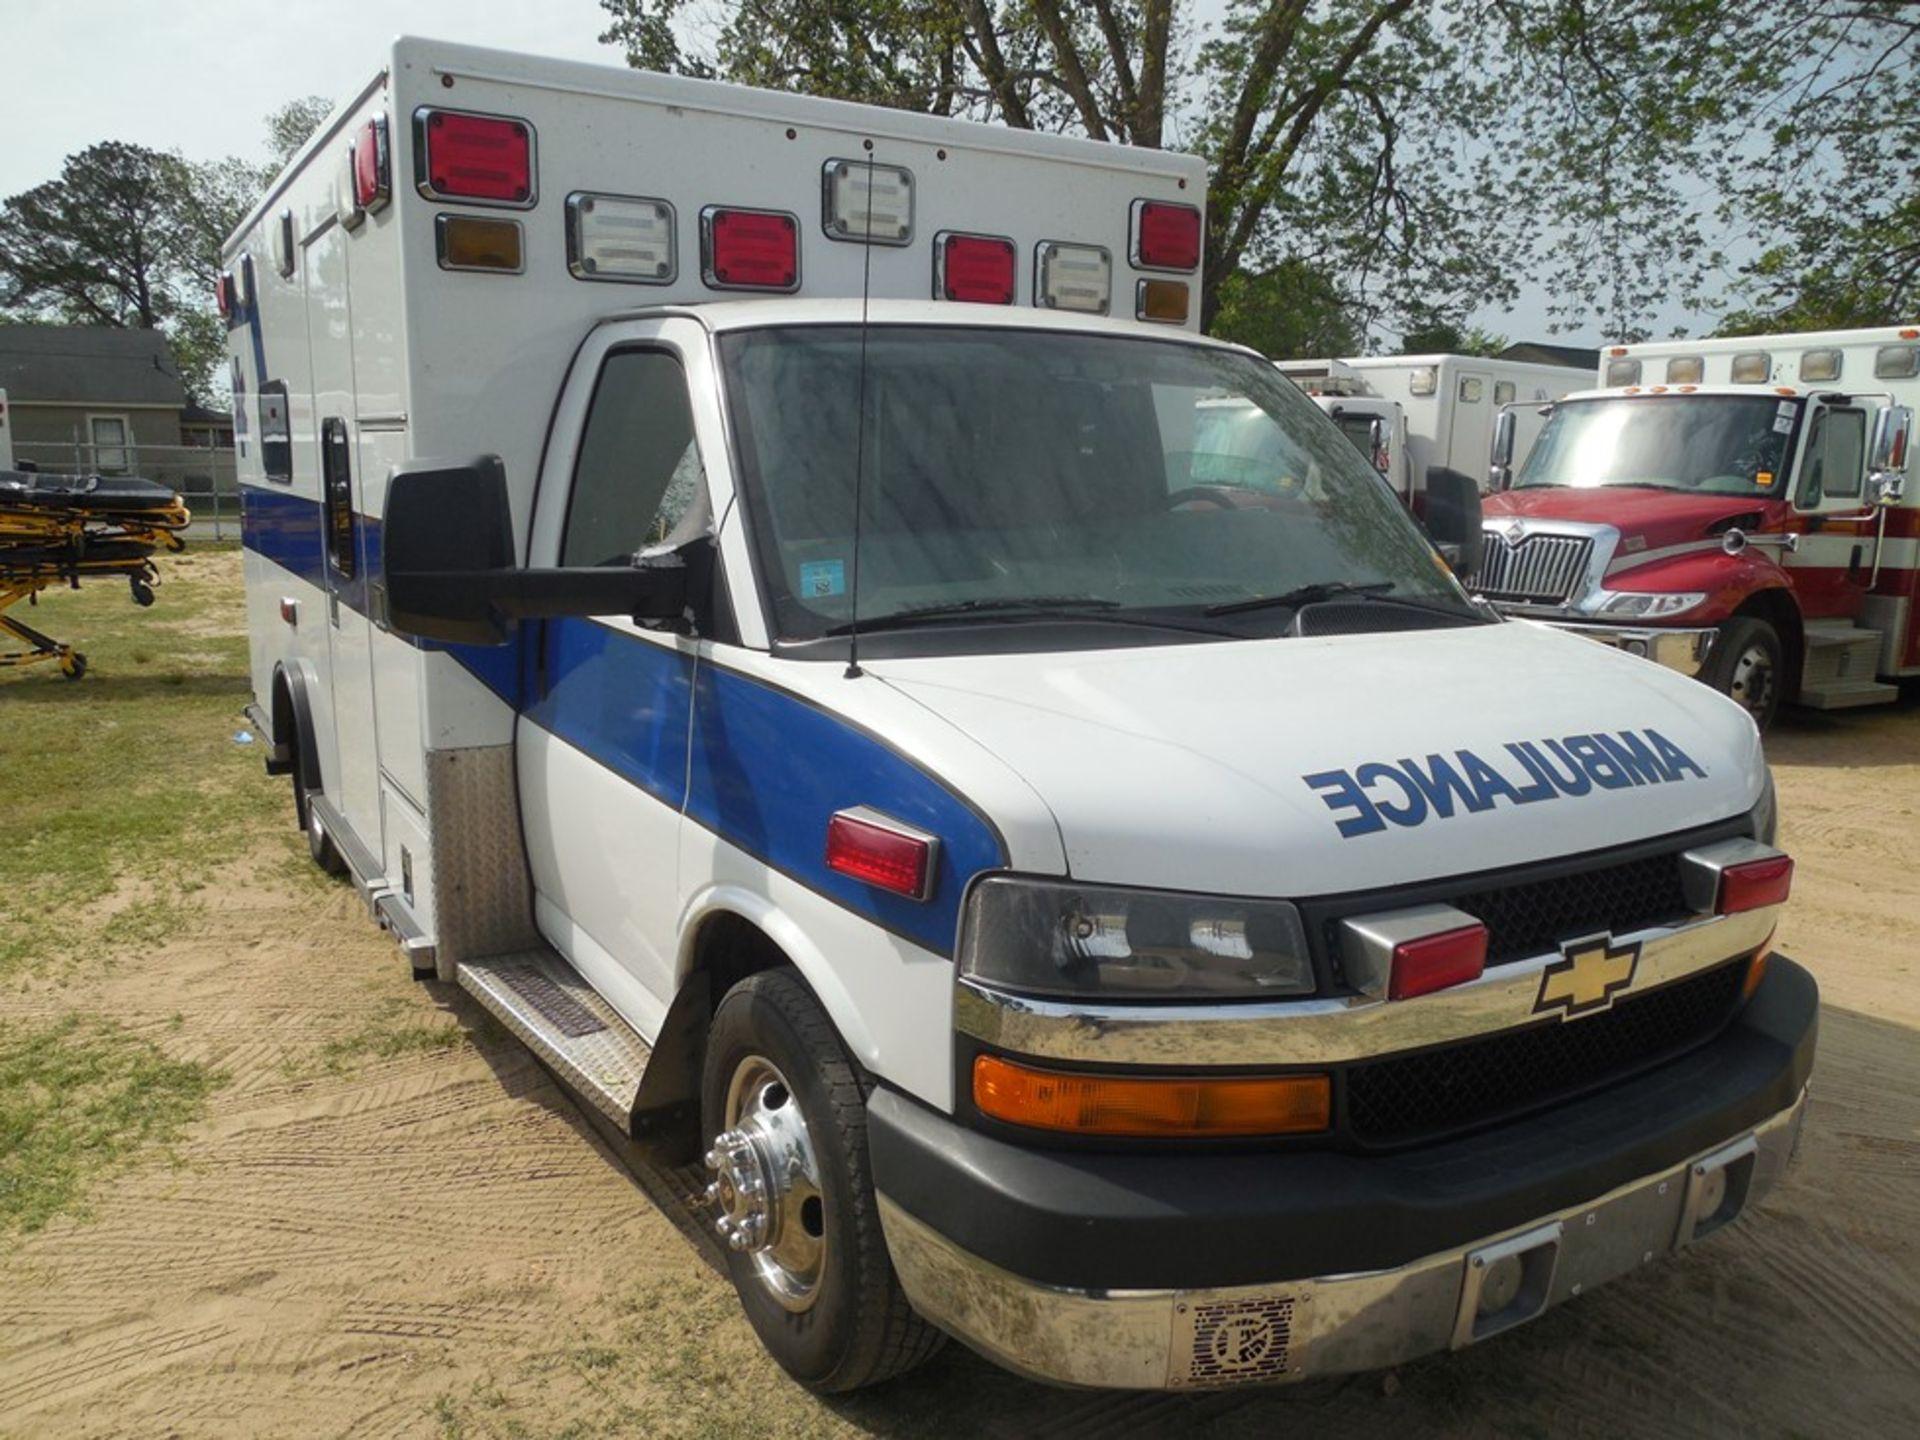 2009 Chev 4500 dsl, box ambulance 226,356 miles vin# 1GBKG316191158061 - Image 3 of 6